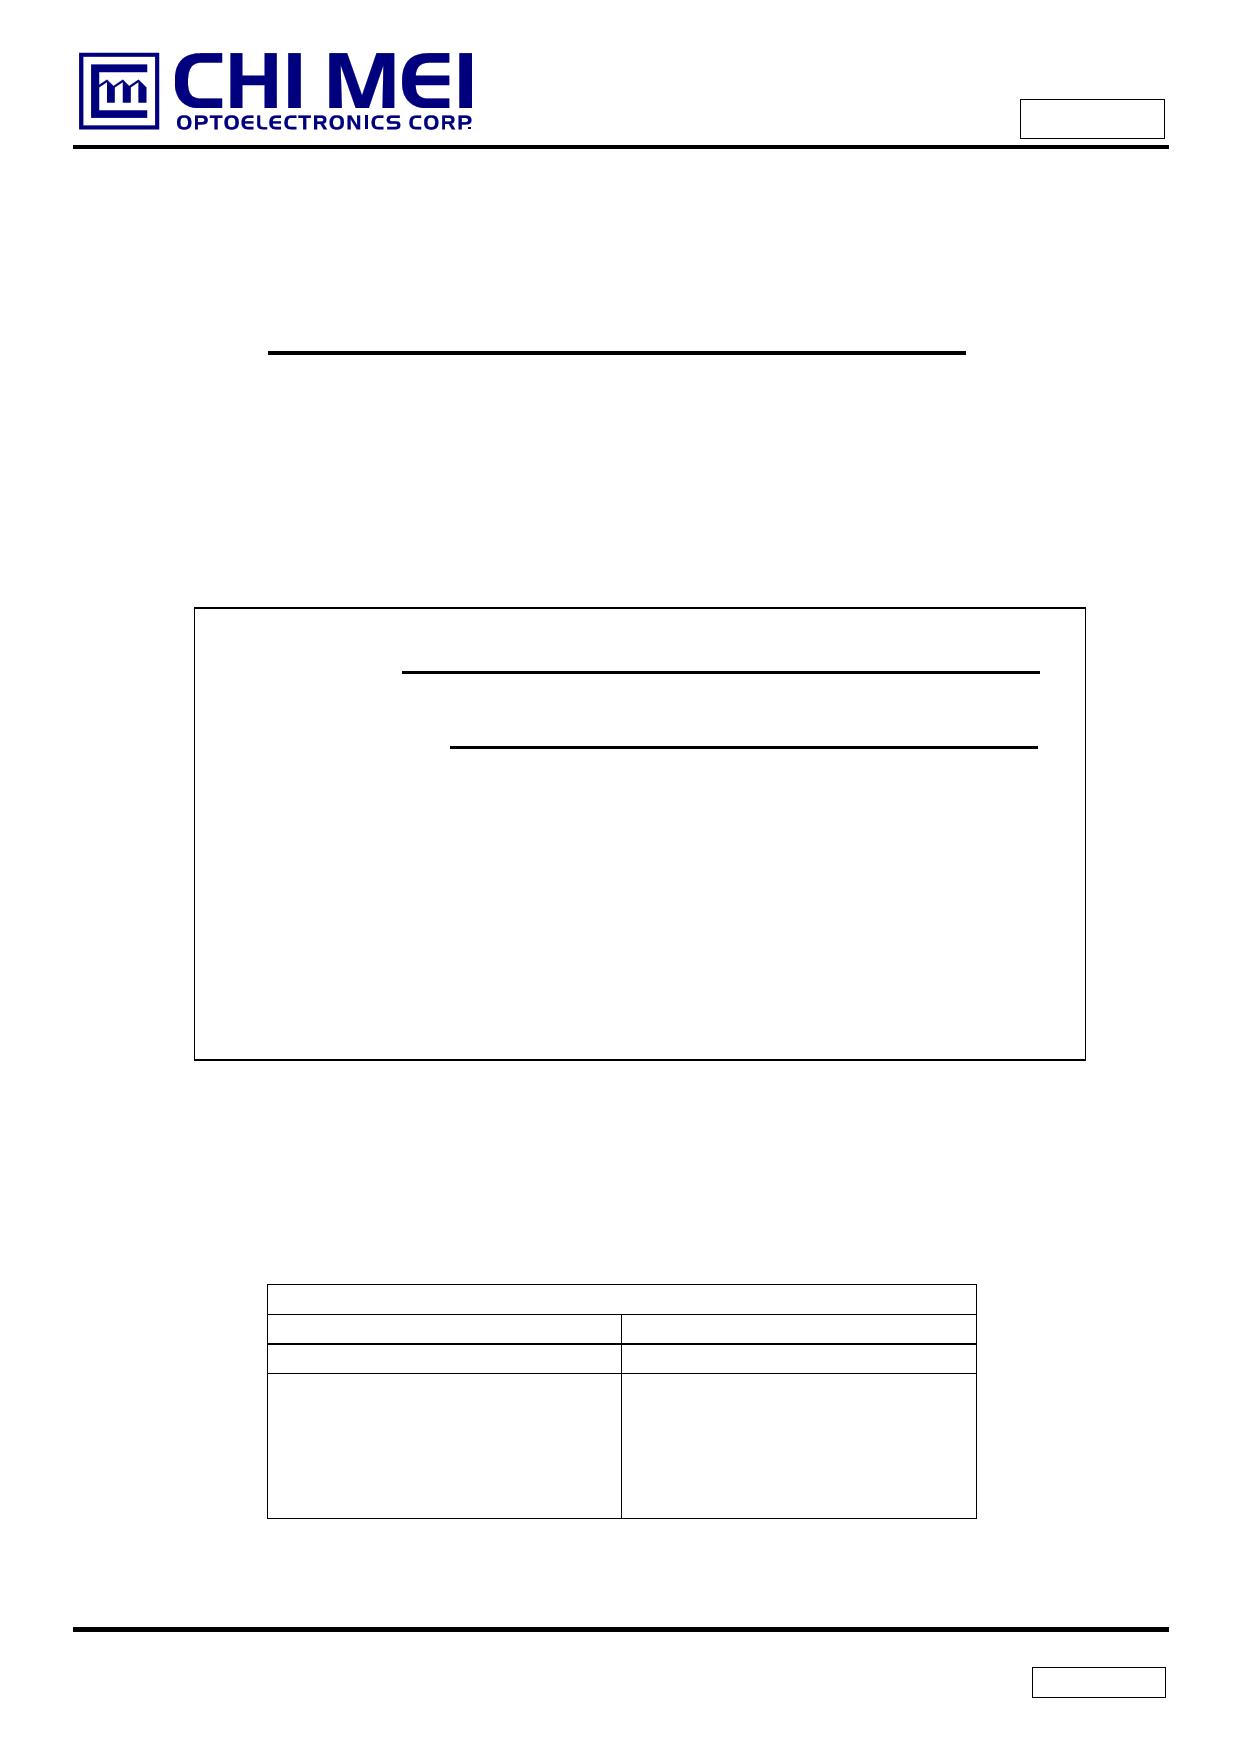 G104S1-L01 datasheet